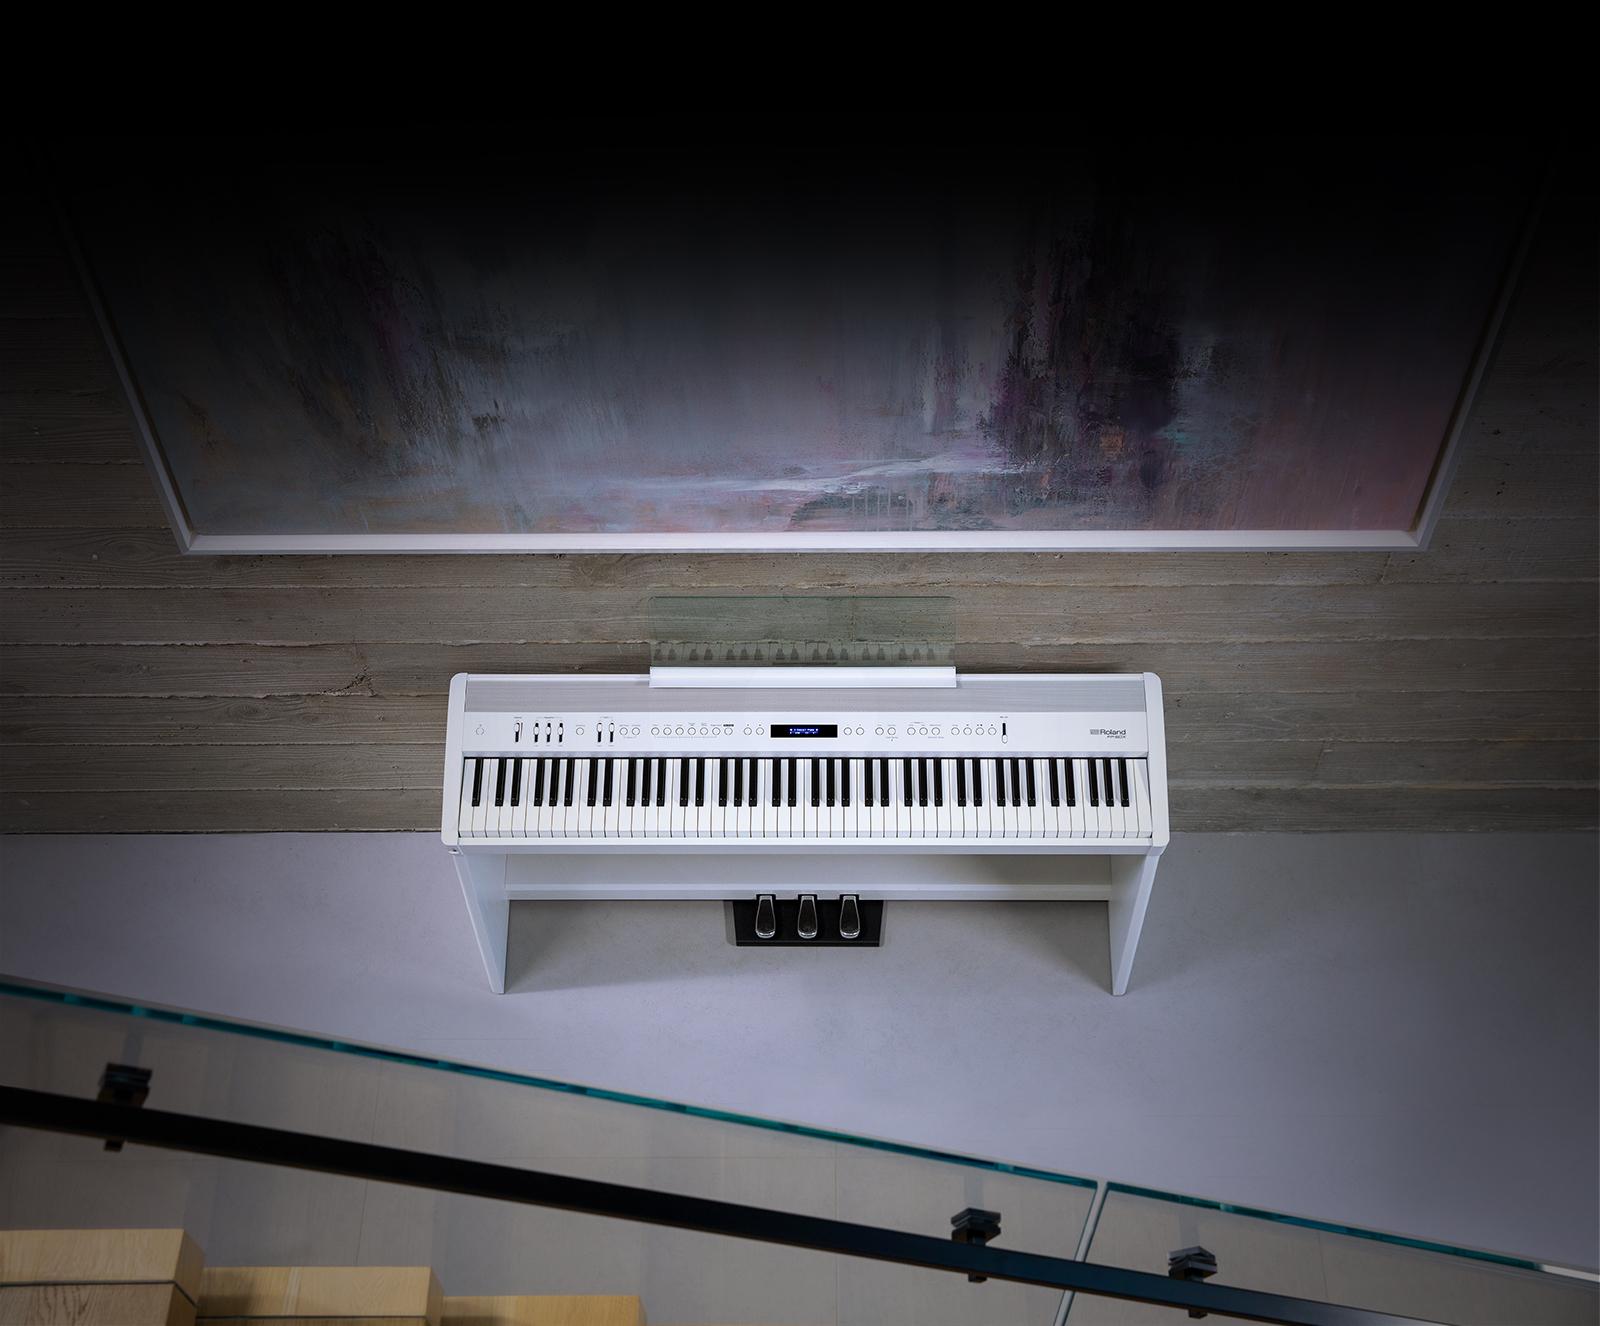 Roland Fp X Series